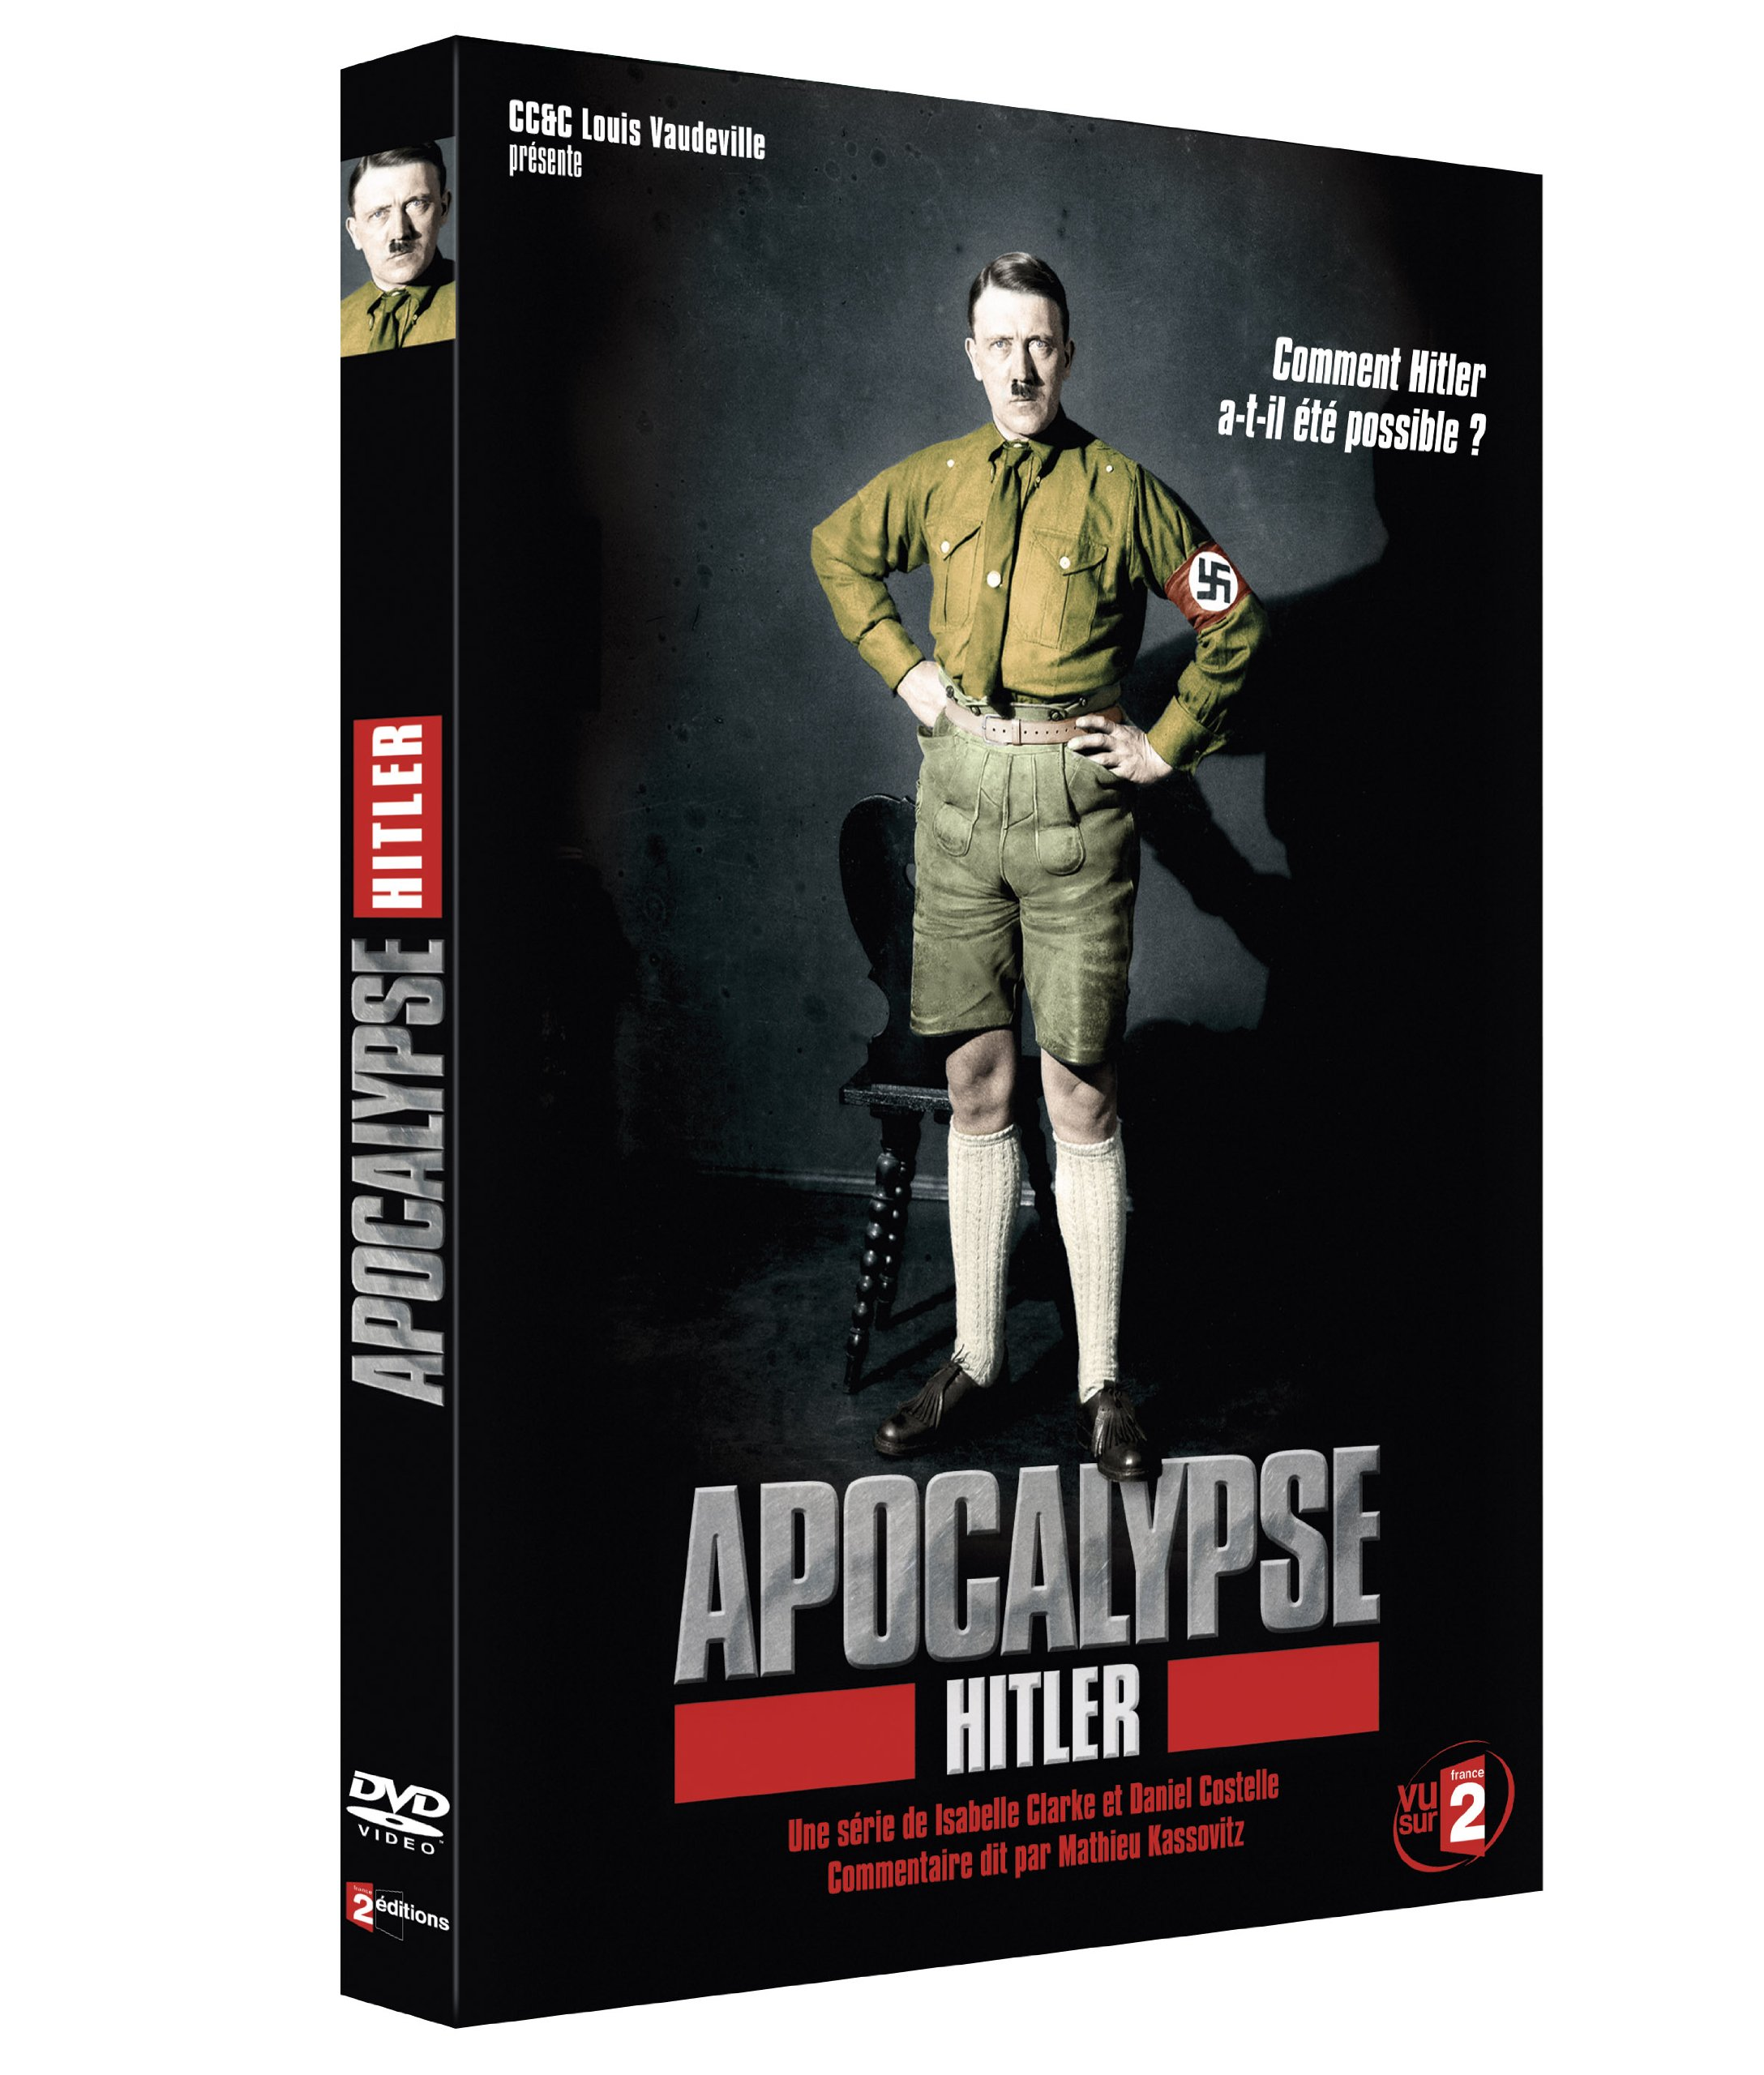 Apocalypse - Hitler [Francia] [DVD]: Amazon.es: Isabelle Clarke, Daniel Costelle: Cine y Series TV